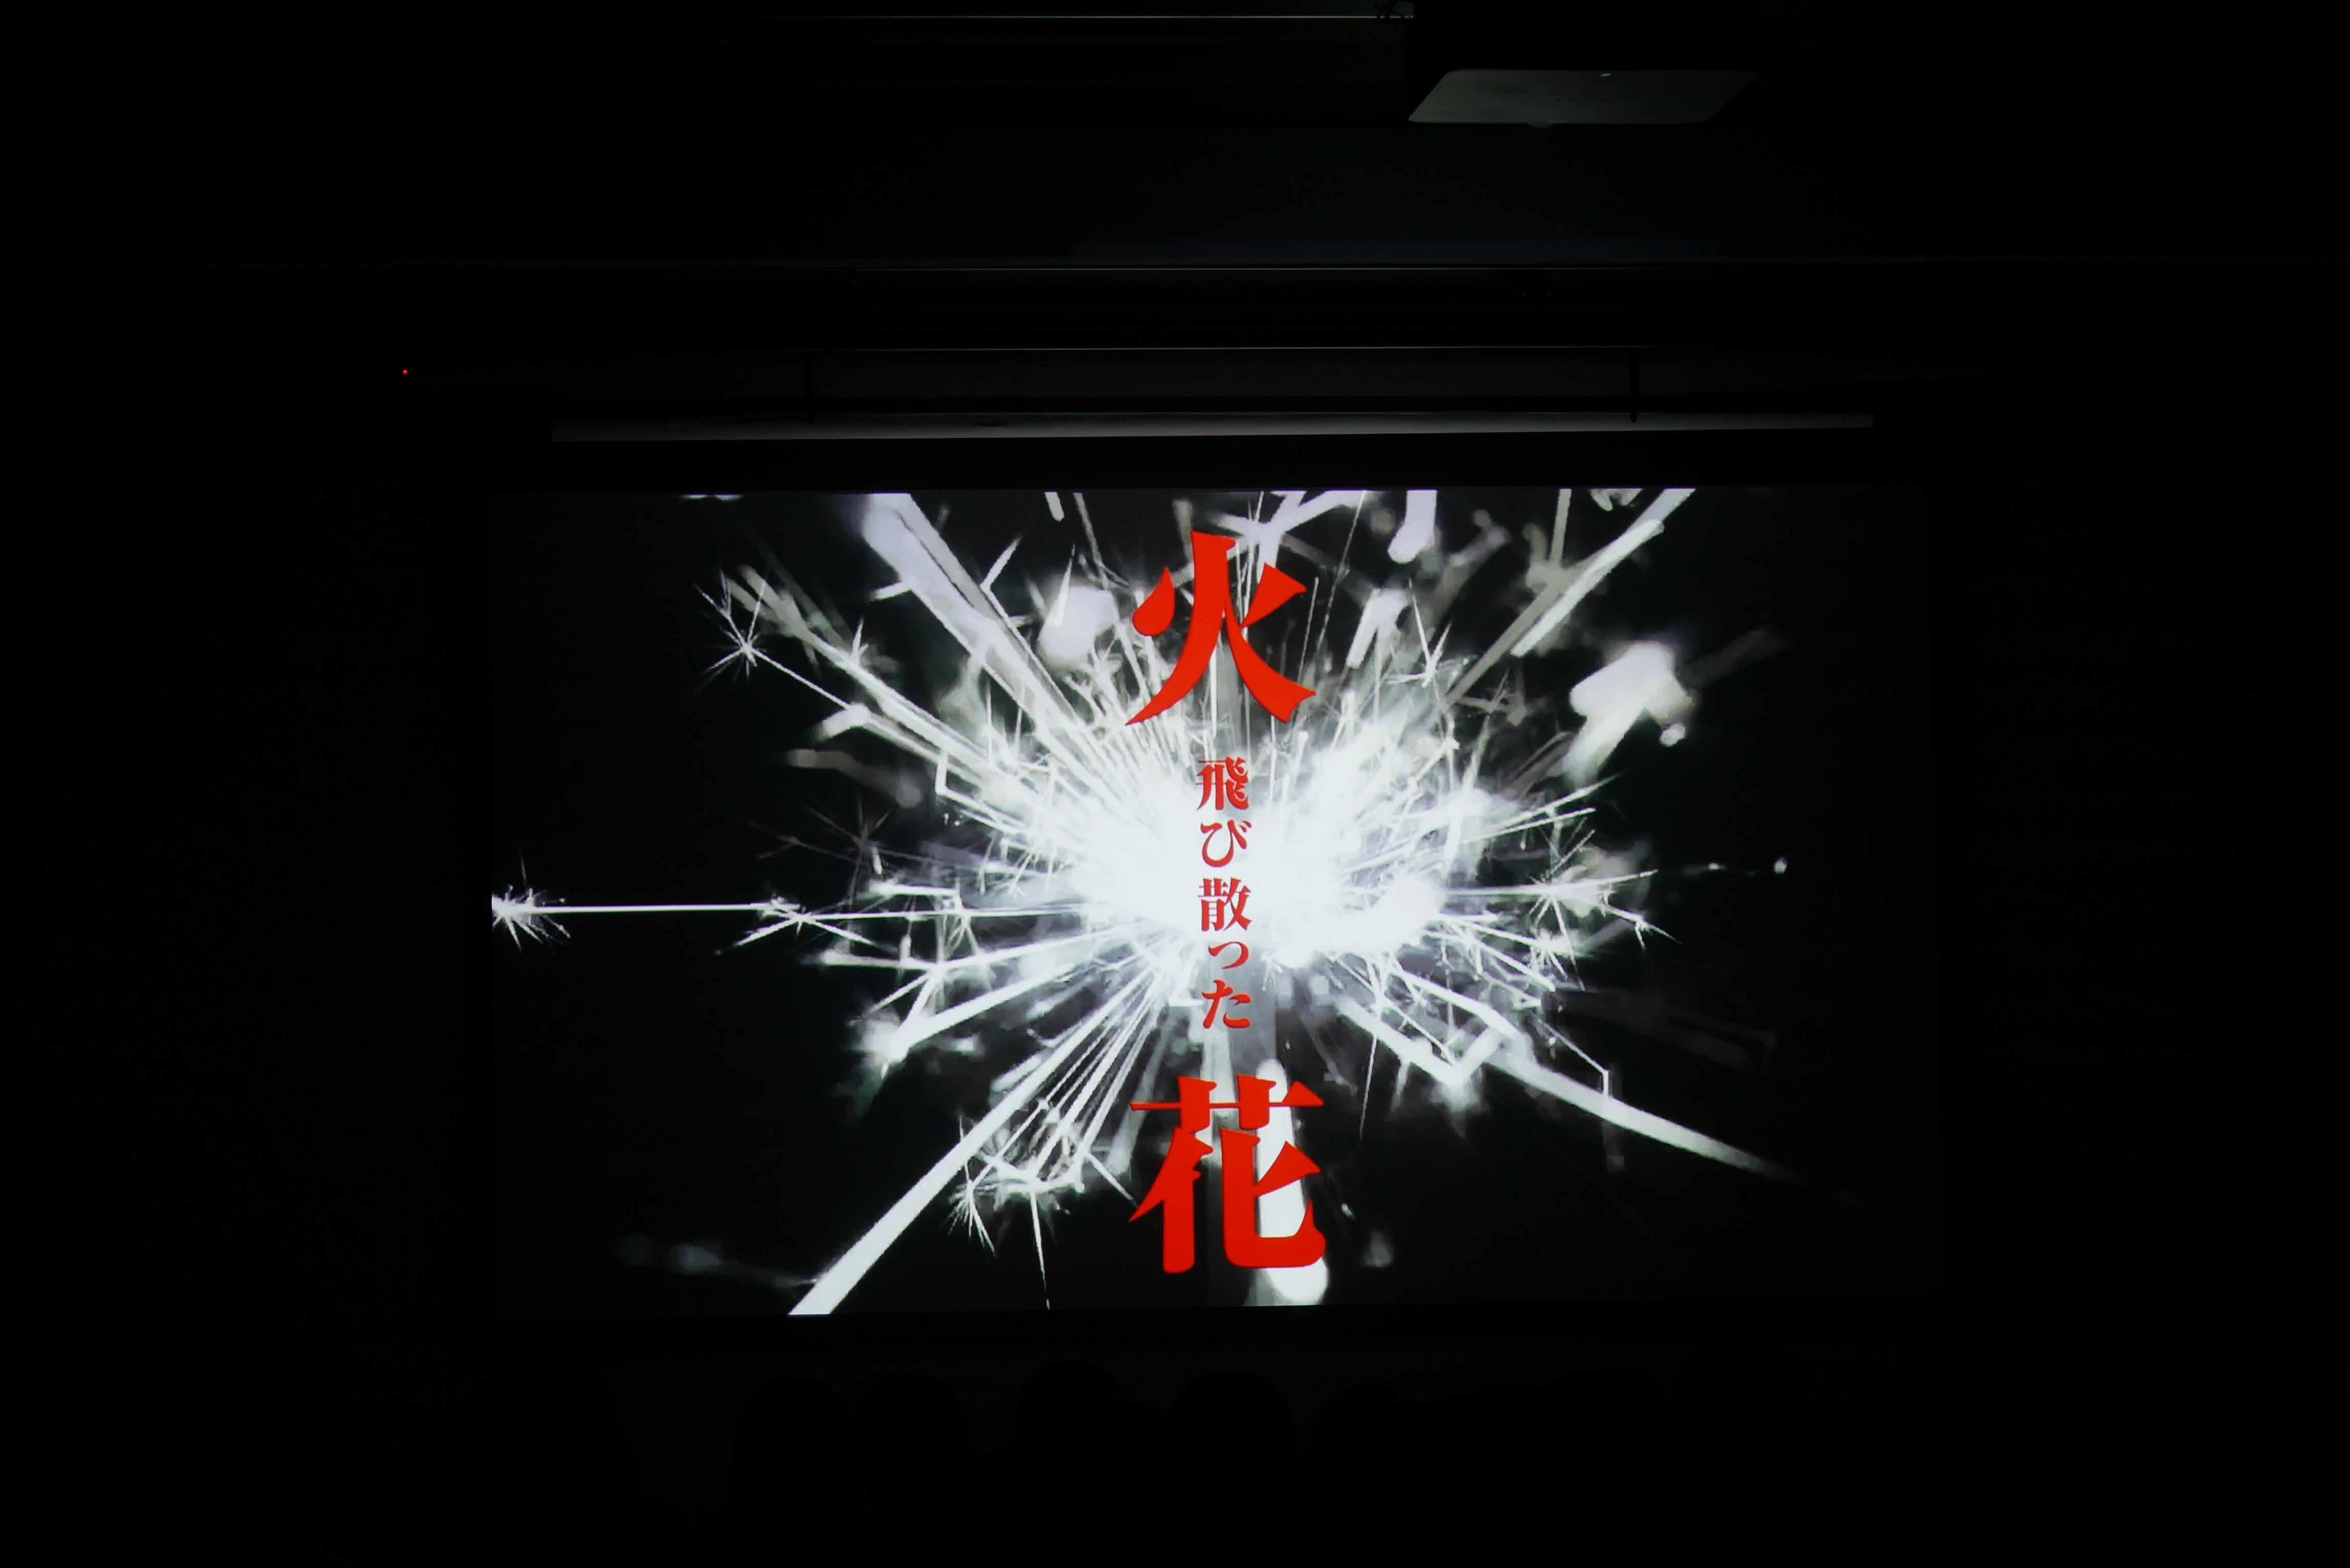 FLOW Discuss New Album 'TRIBALYTHM' in Live Stream | MOSHI